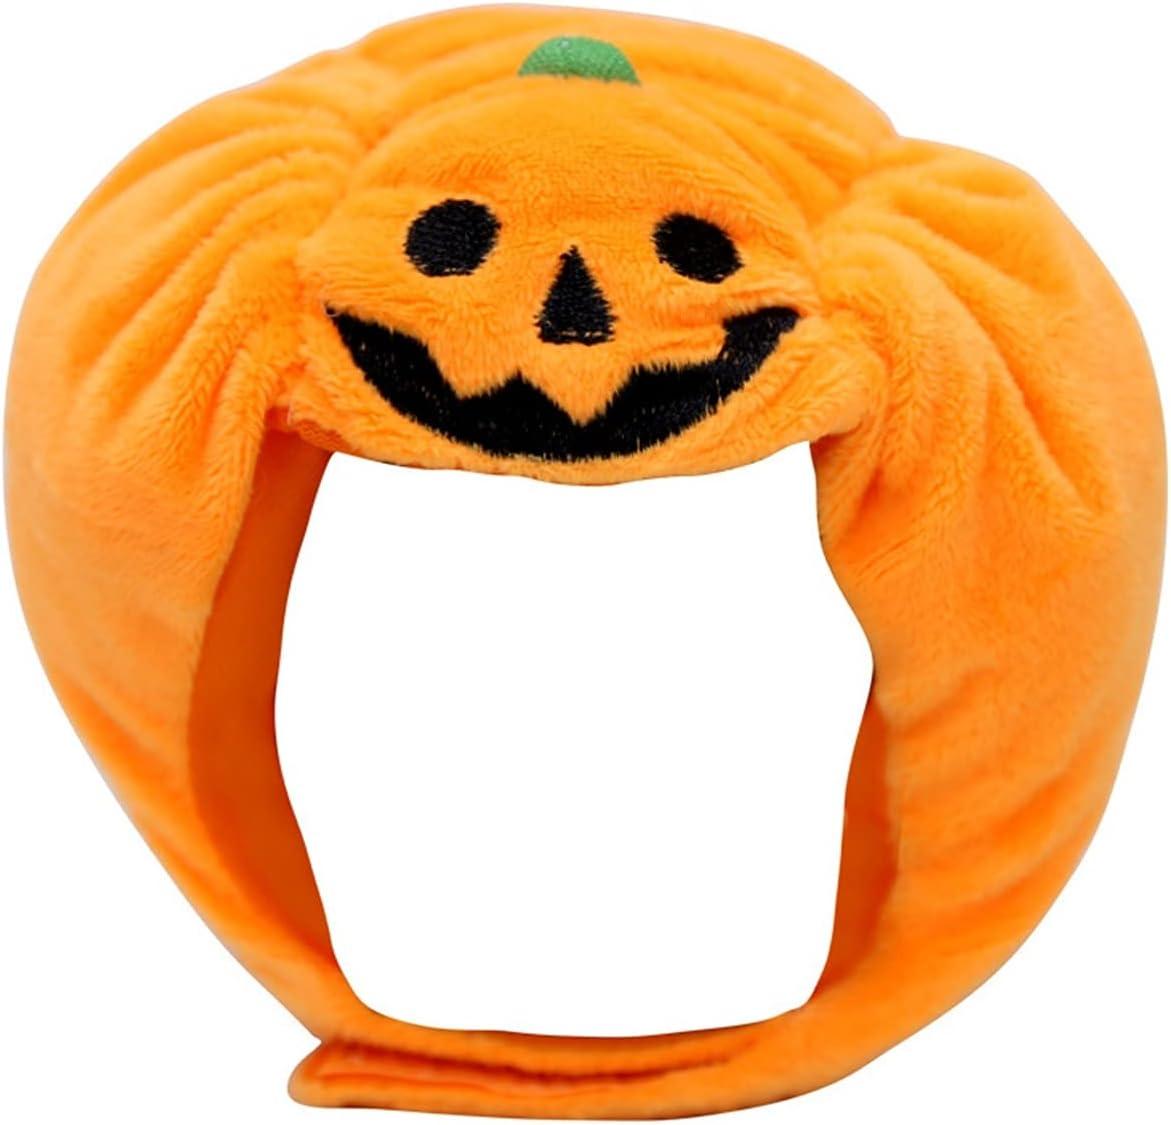 Pet Pumpkin 55% OFF Surprise price Hat Halloween Decorations Decoration Festival Ghost